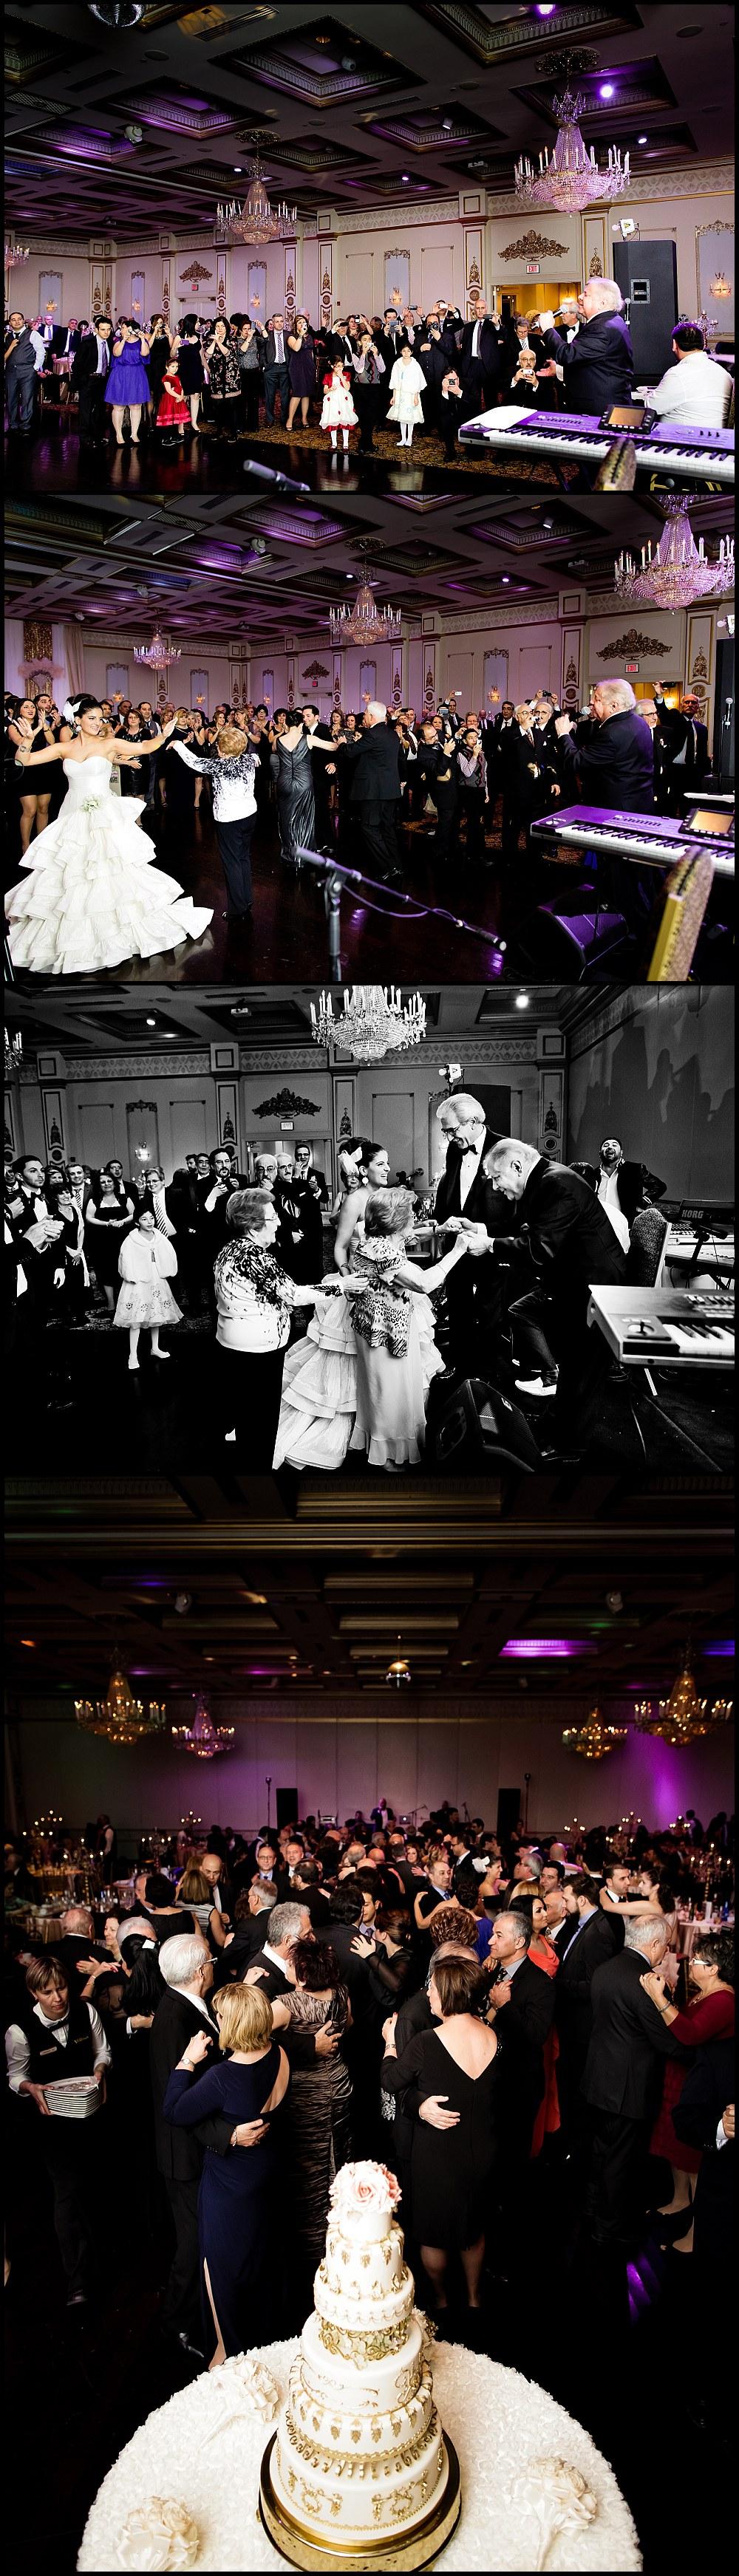 Venetian Banquet reception wedding in Toronto Canada -  Roupen Matevossian, Ruben Matevosyan